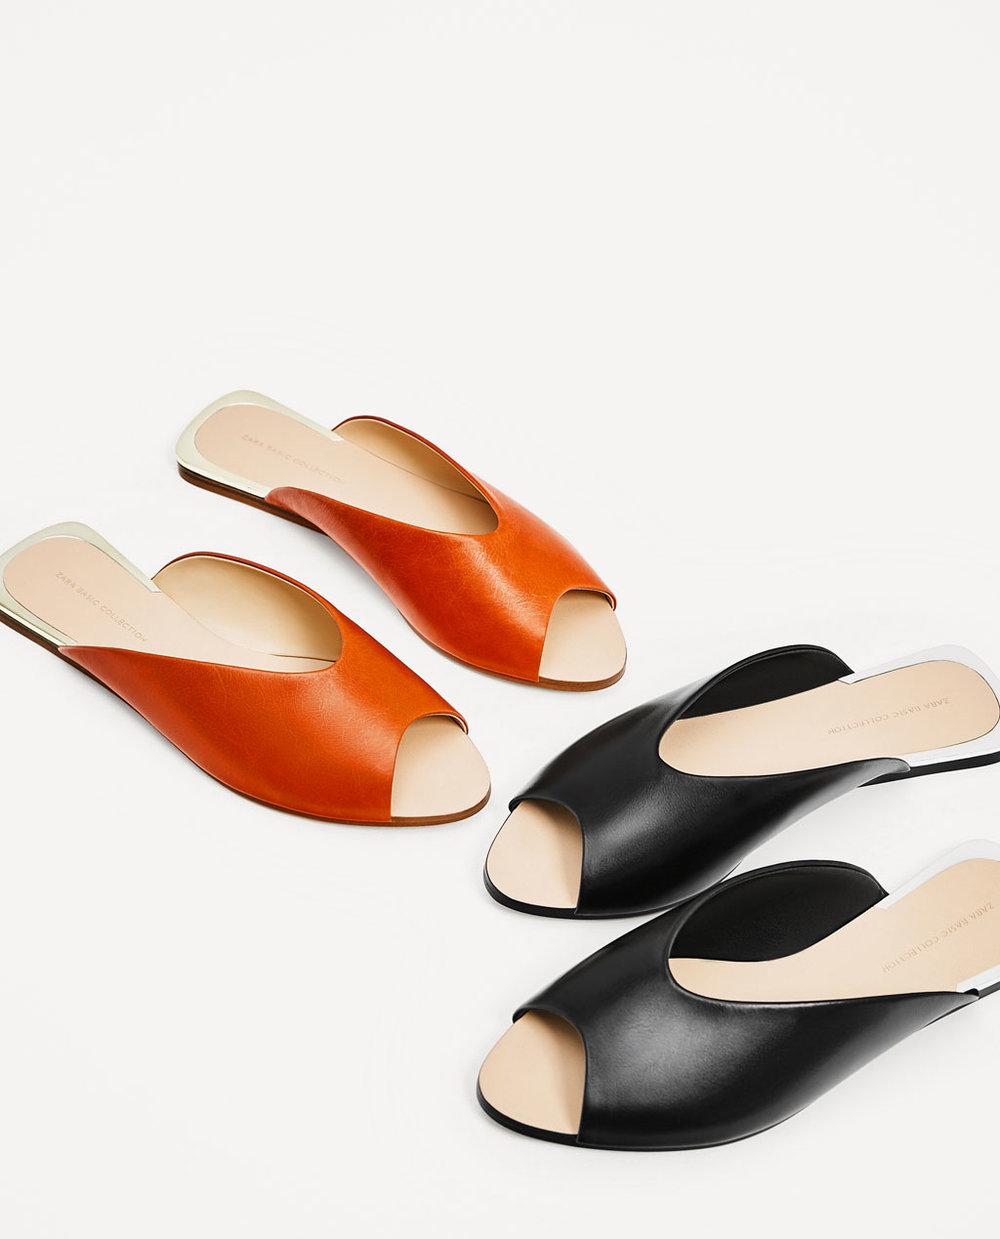 Ph: Zara Leather Slides